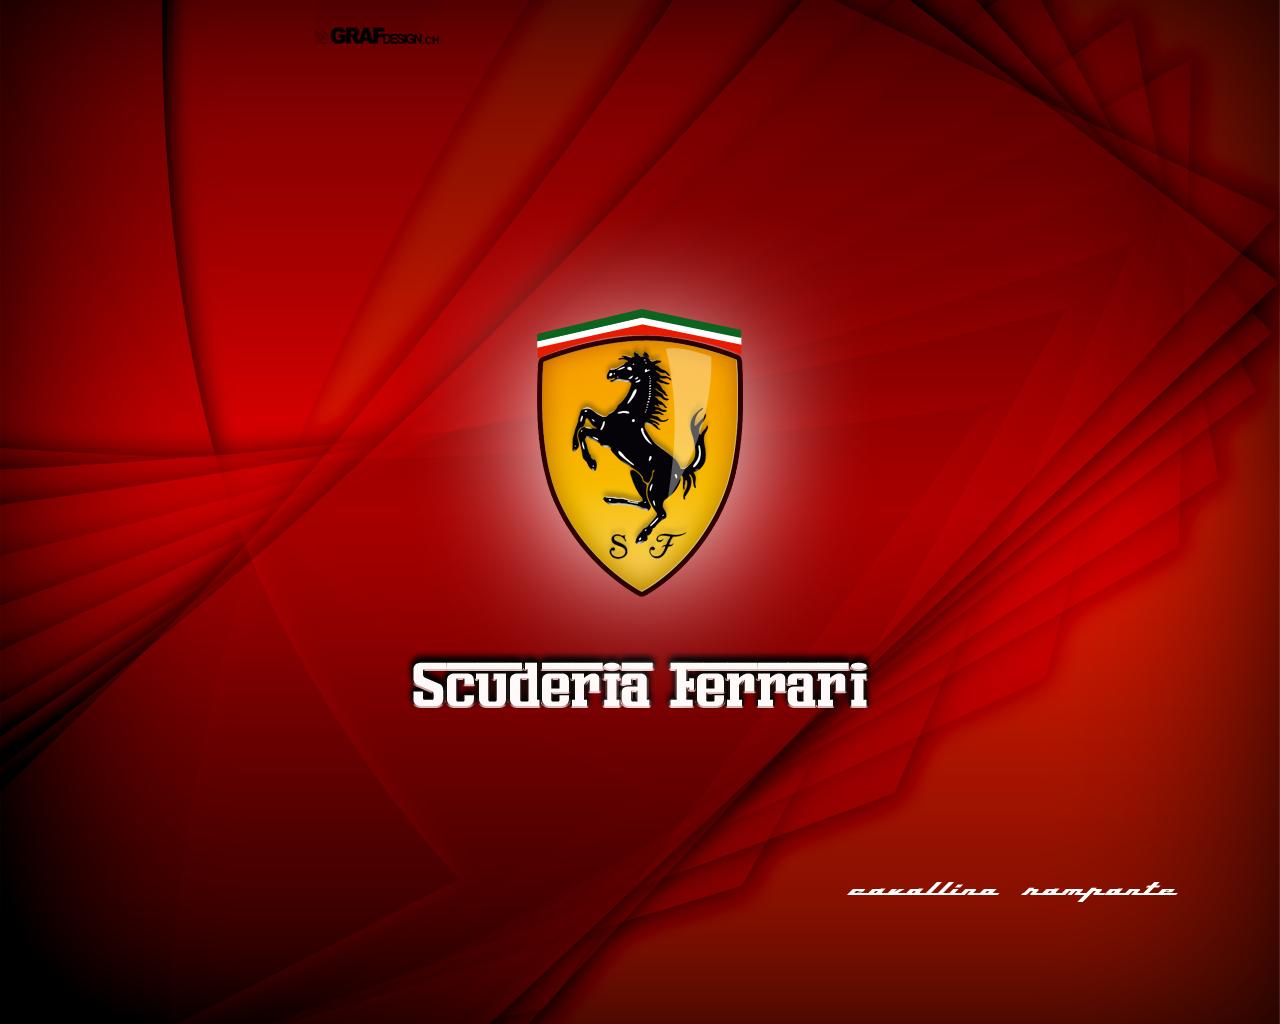 wallpapers ferrari logo - photo #24